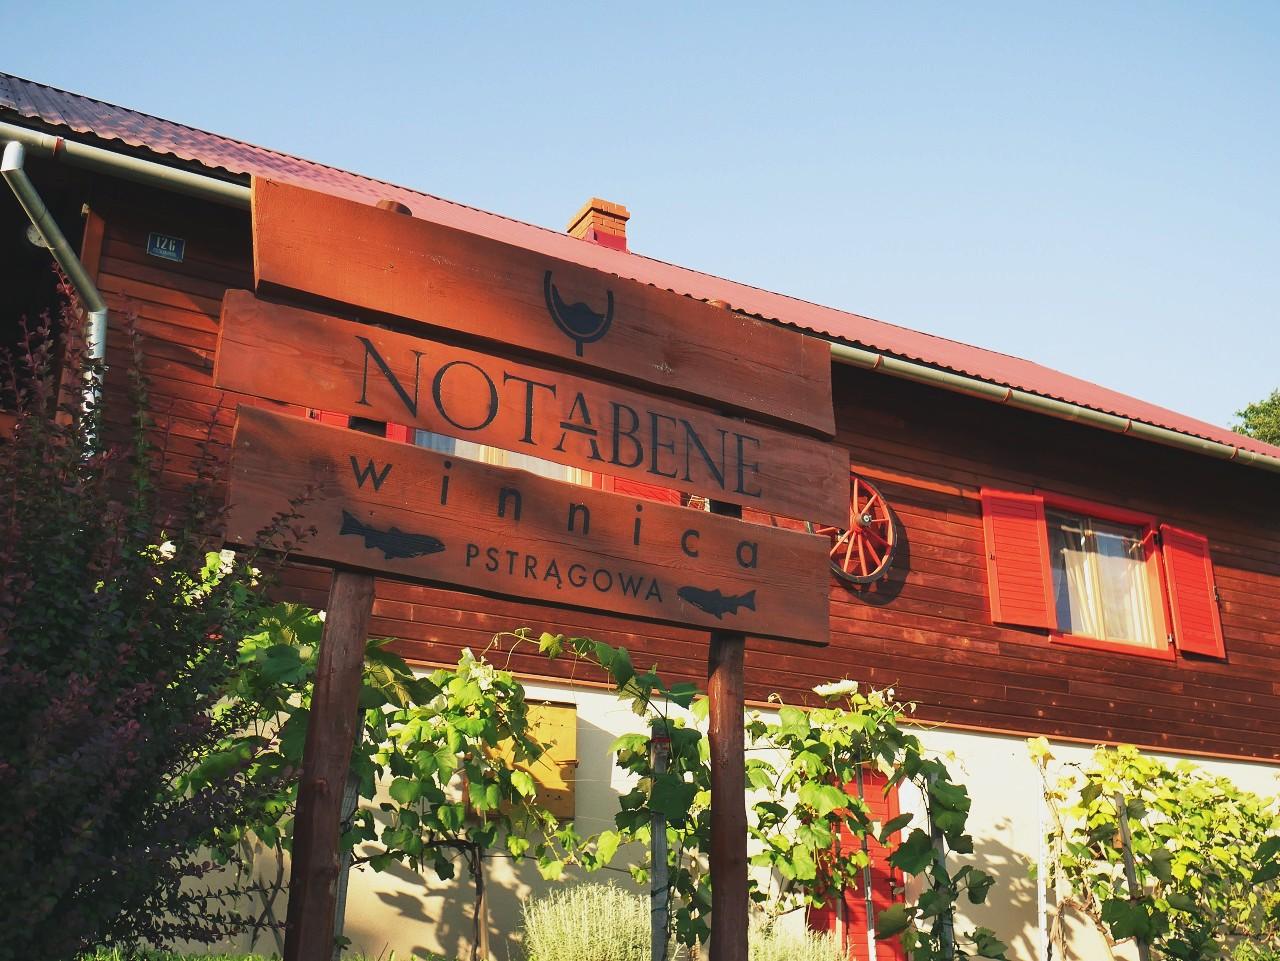 Winnica Notabene